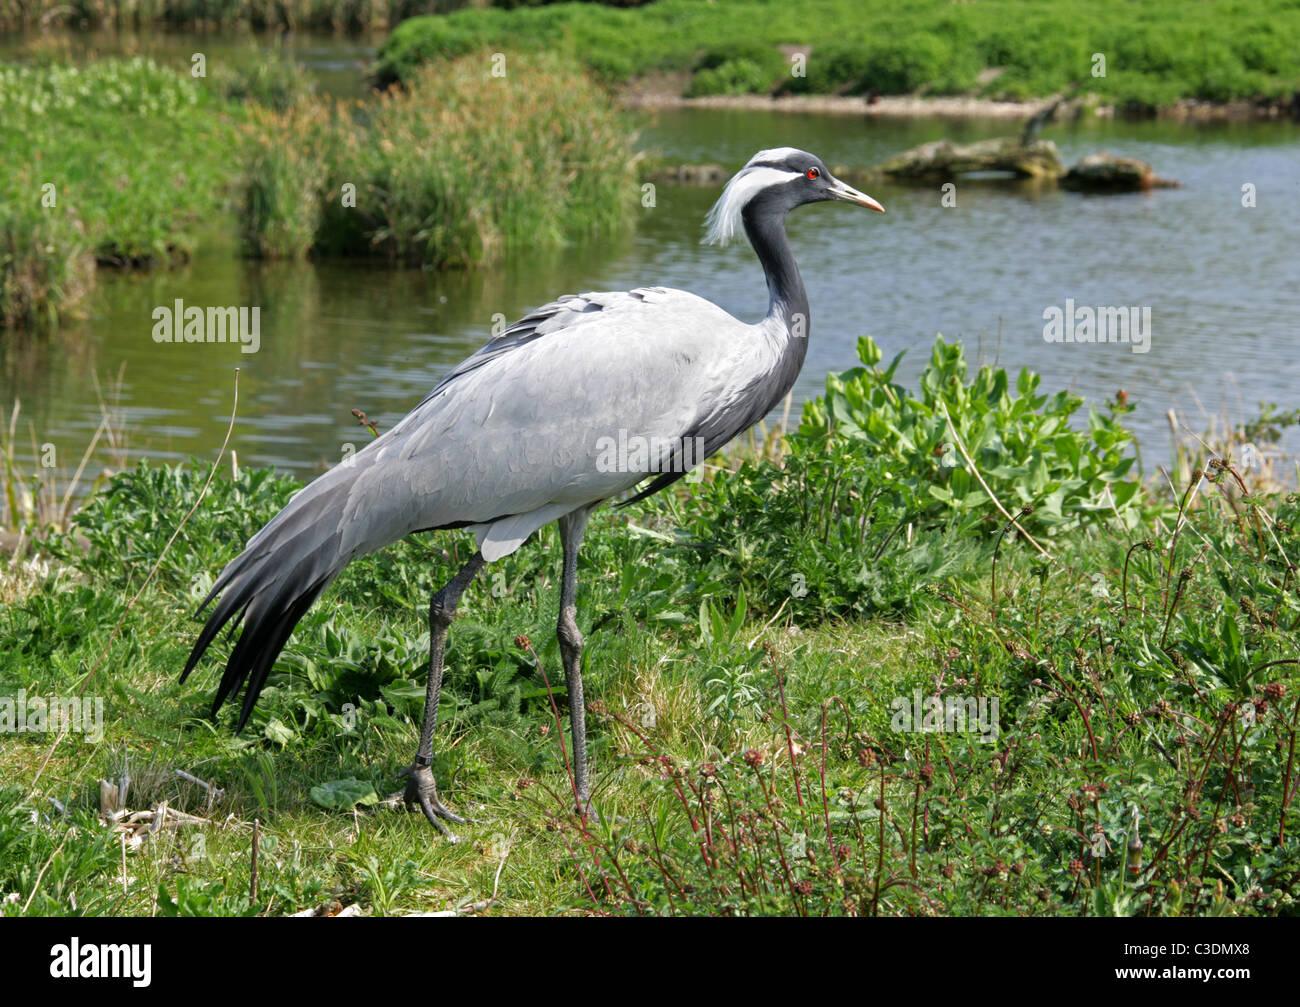 Demoiselle Crane or Lovely Lady Crane, Anthropoides virgo, Gruidae, Gruiformes. Stock Photo